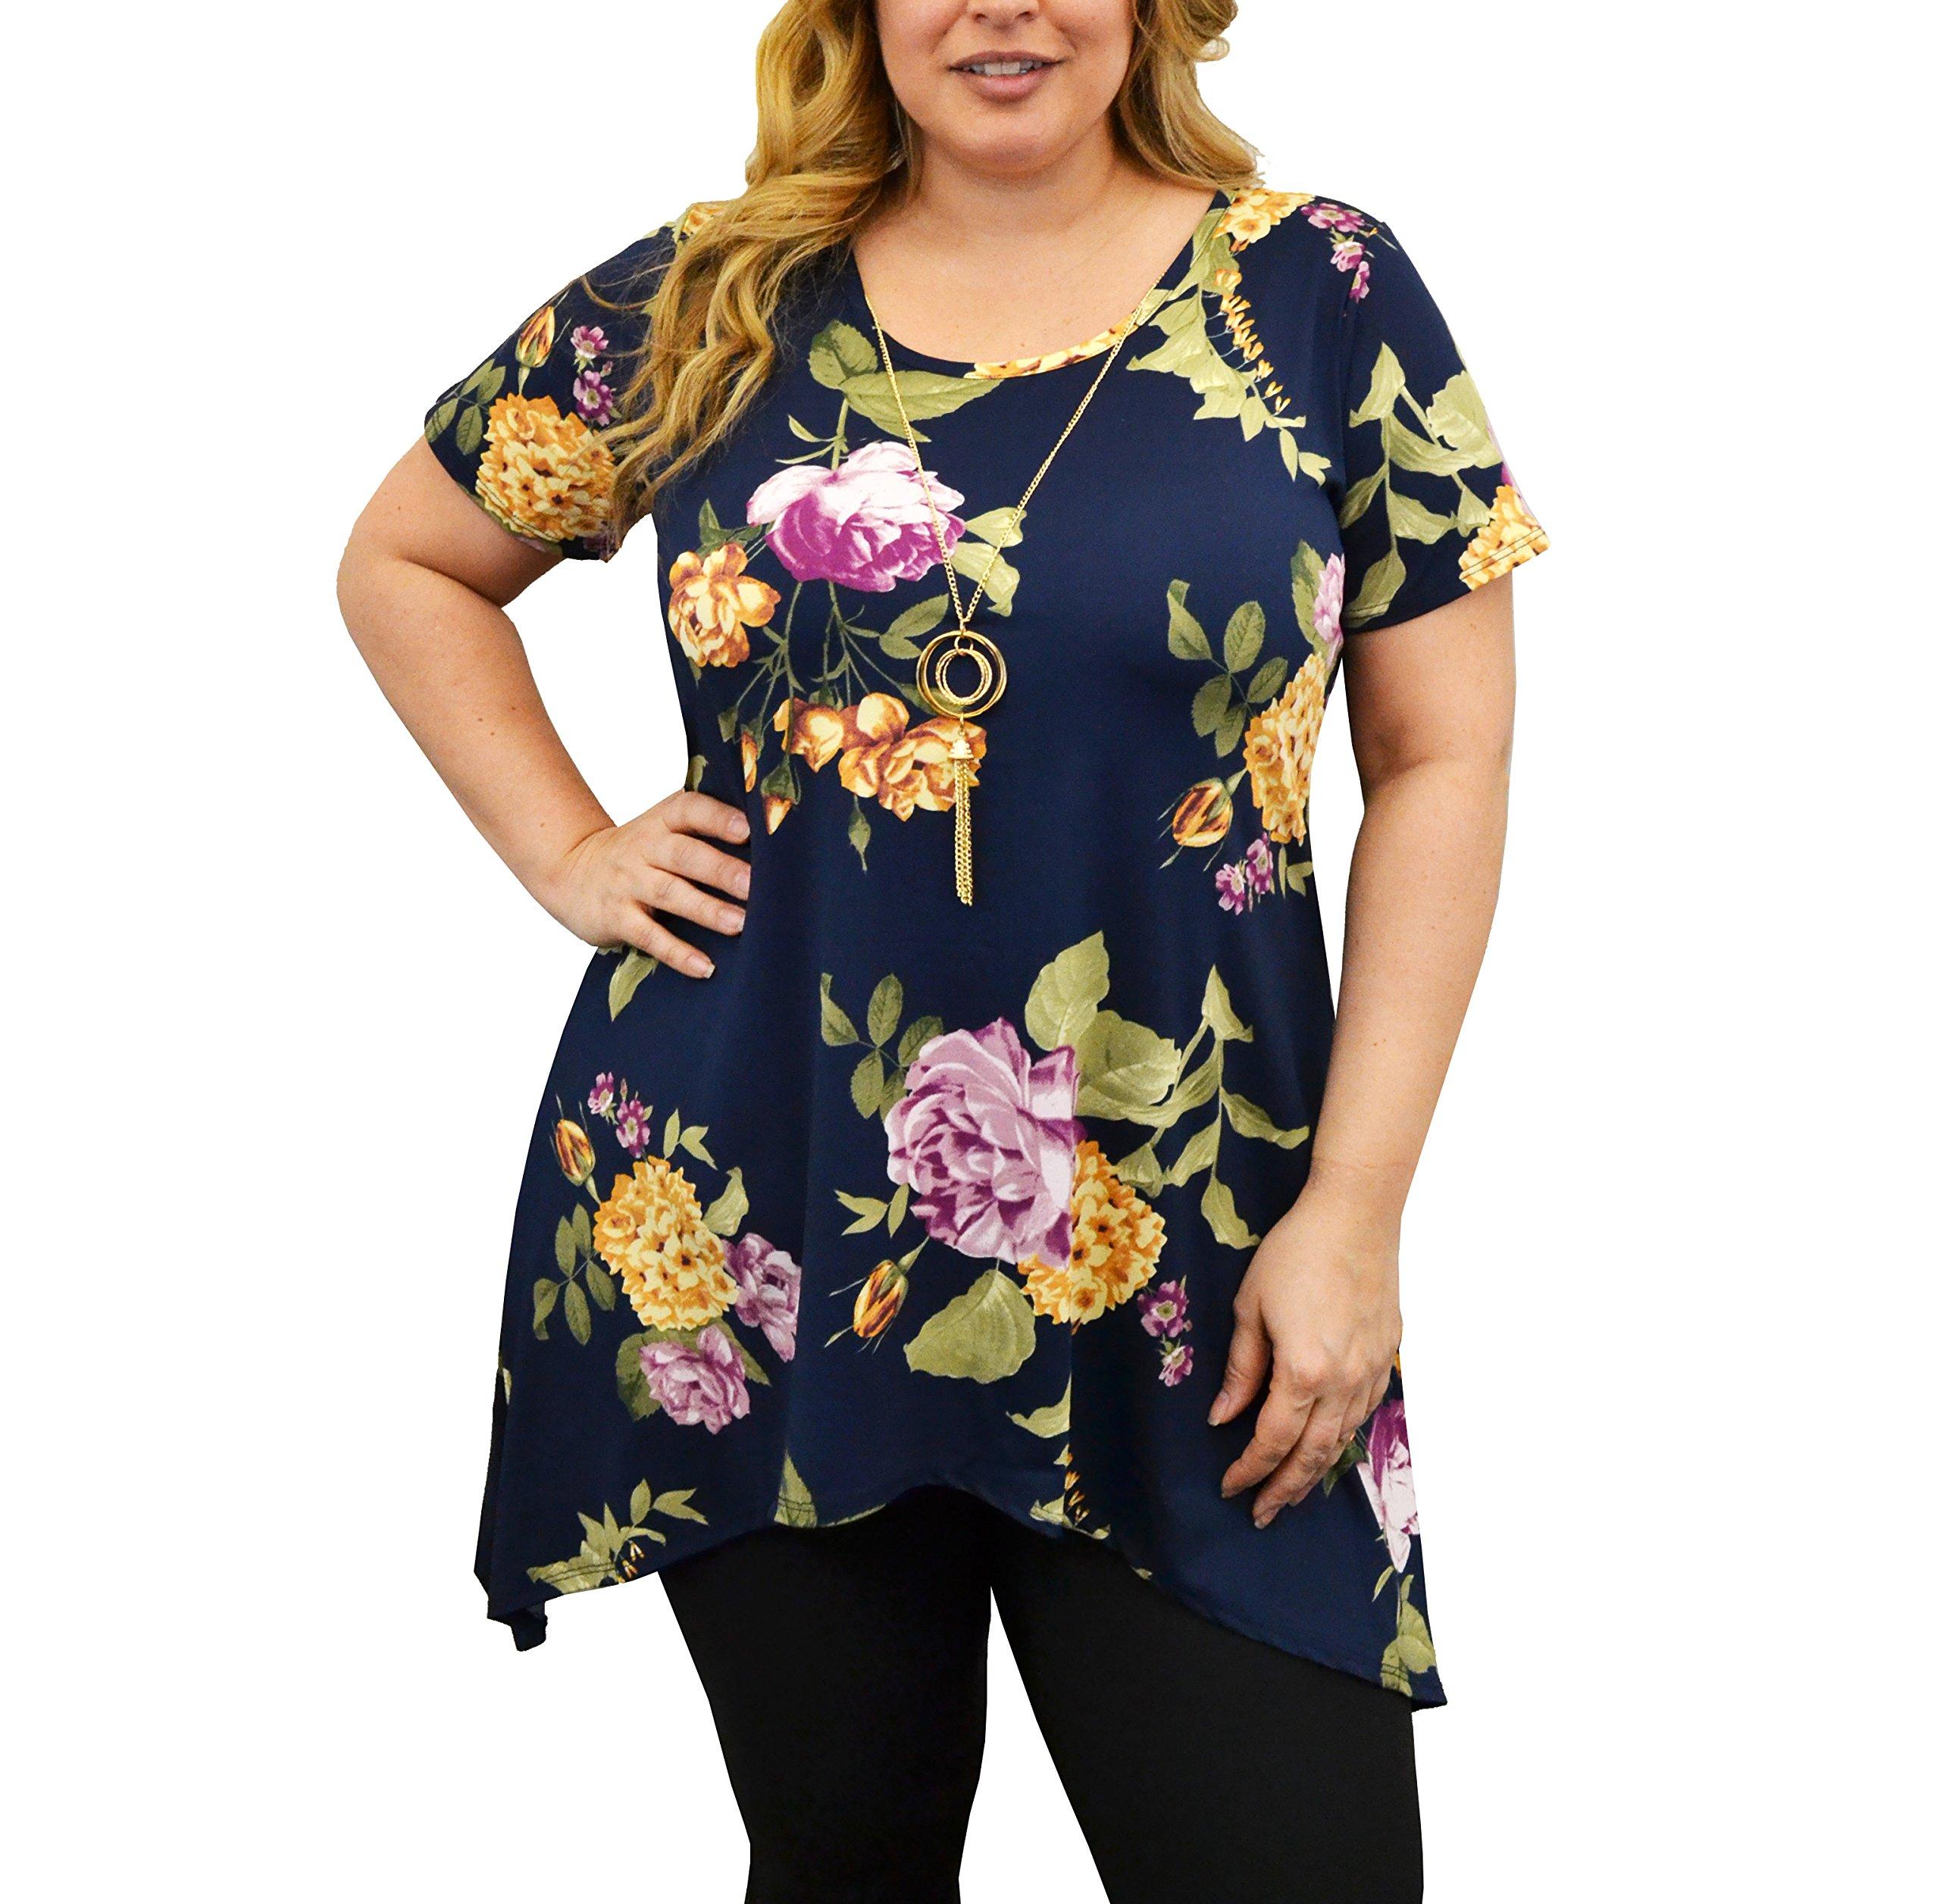 Urban Rose Womens Plus-Size Top, Sharkbite Hem with Necklace